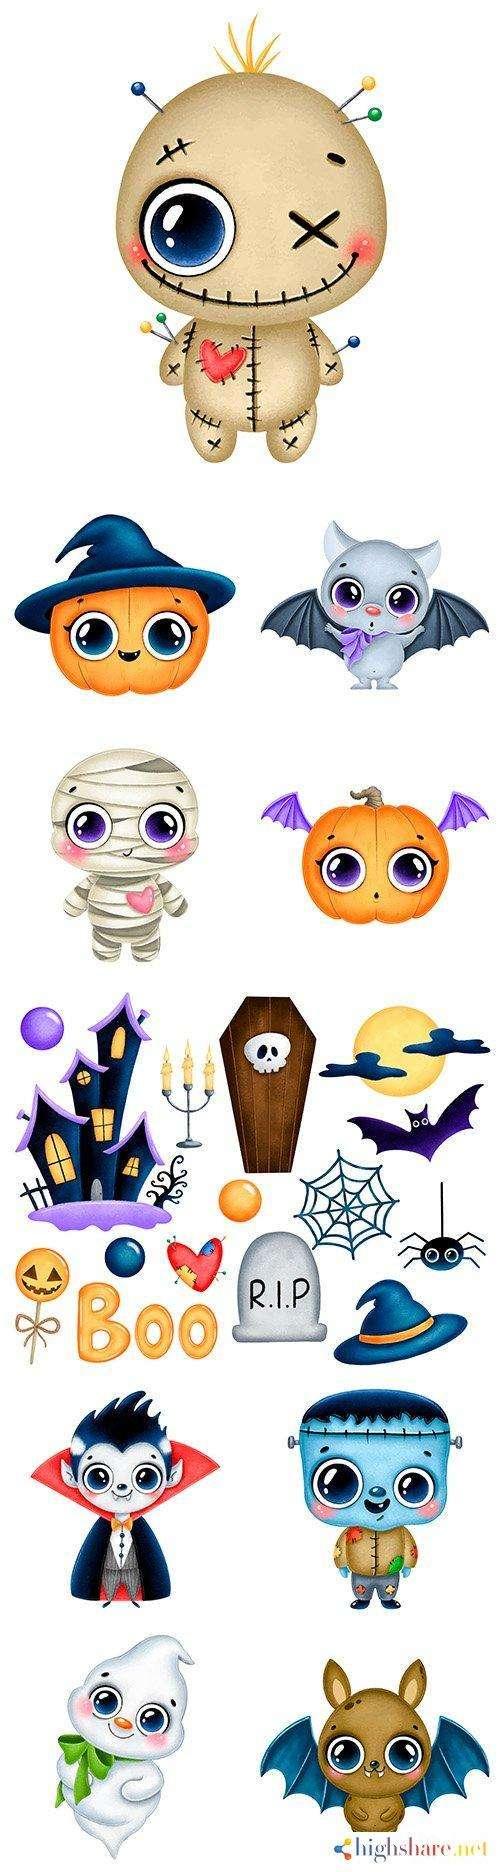 halloween holiday illustration cute cartoon character 5f452f73b55c2 - Halloween holiday illustration cute cartoon character